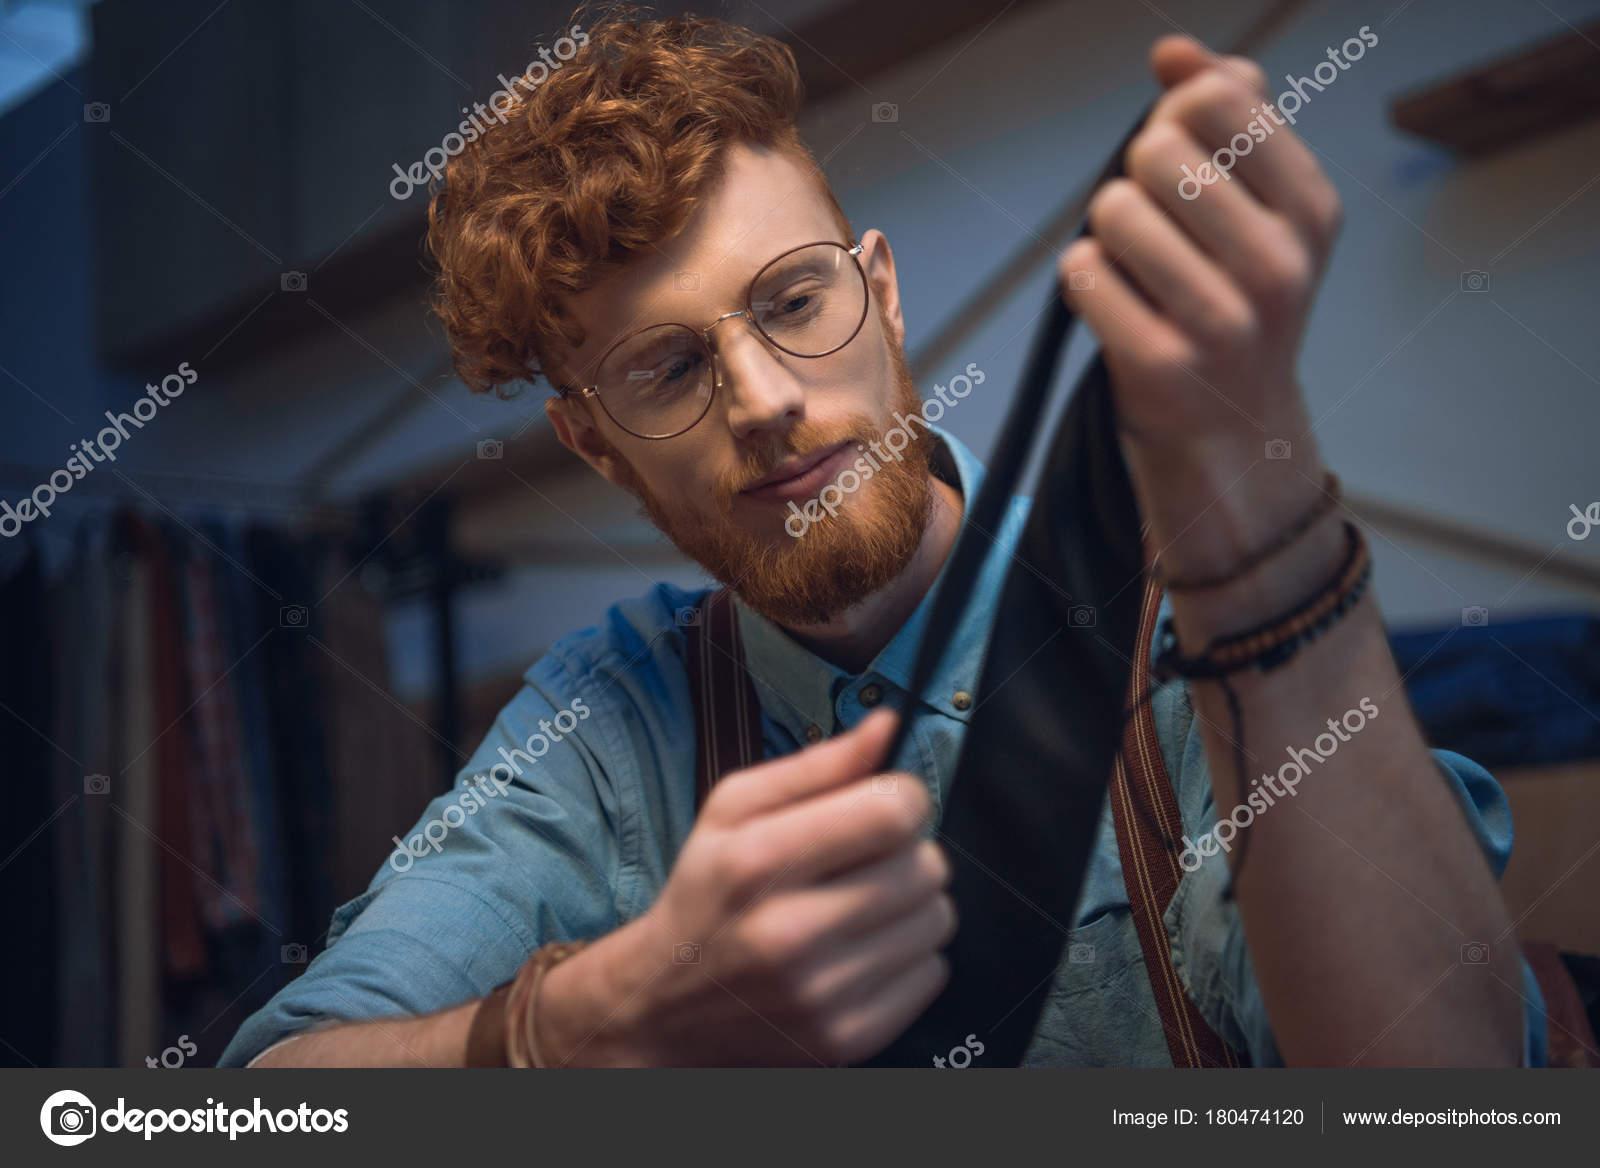 Jeune designer de mode masculine en lunettes tenue cravate noire — Image de  VitalikRadko e2b474f7dd31